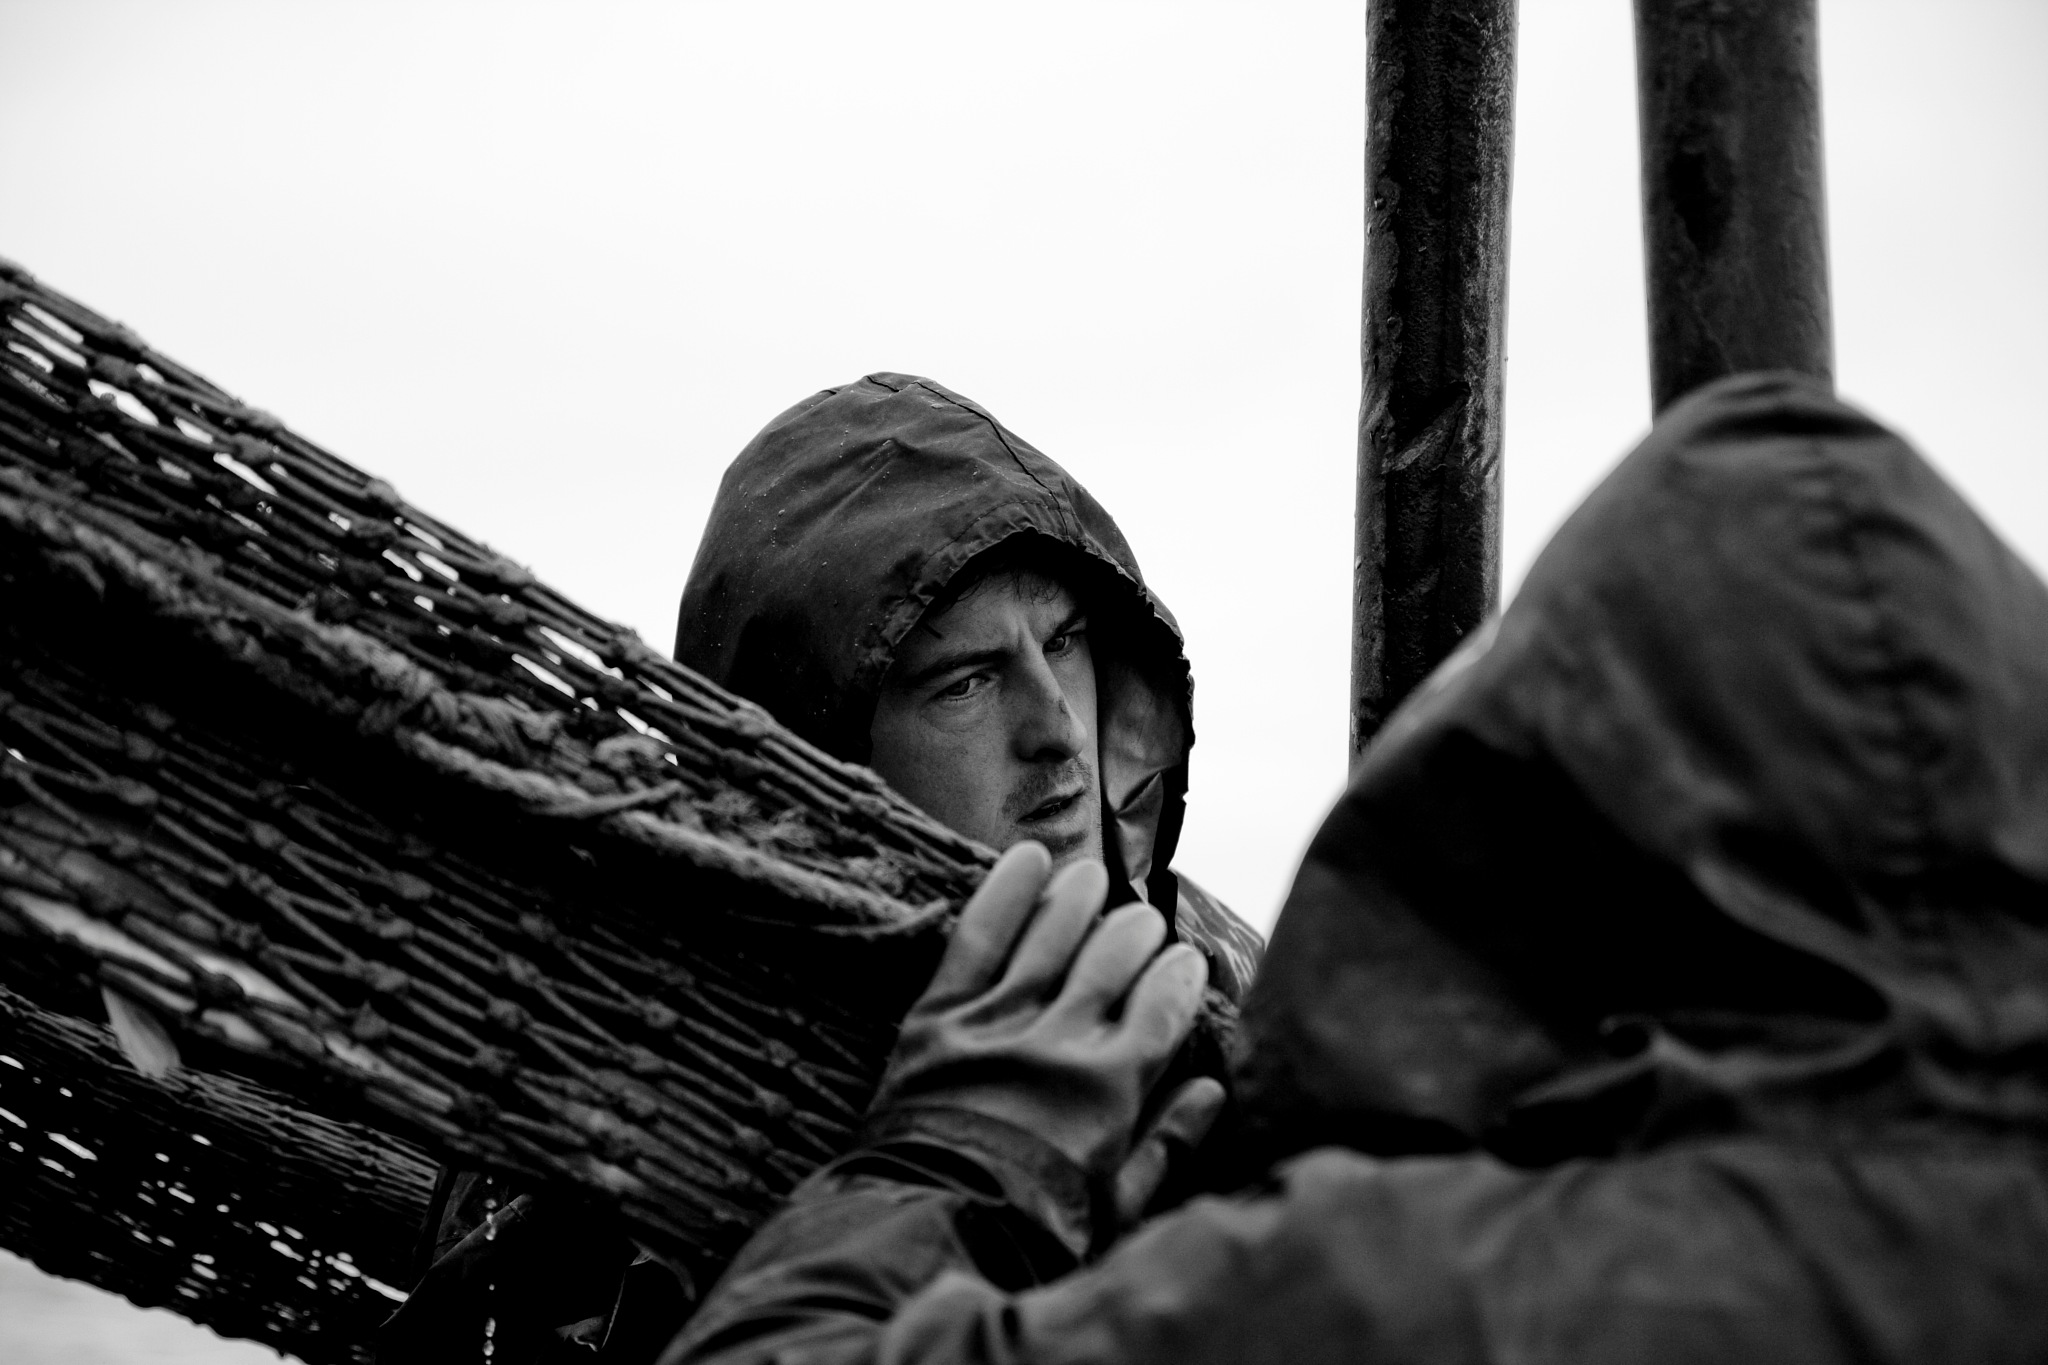 Trawlermen by Silverphoto